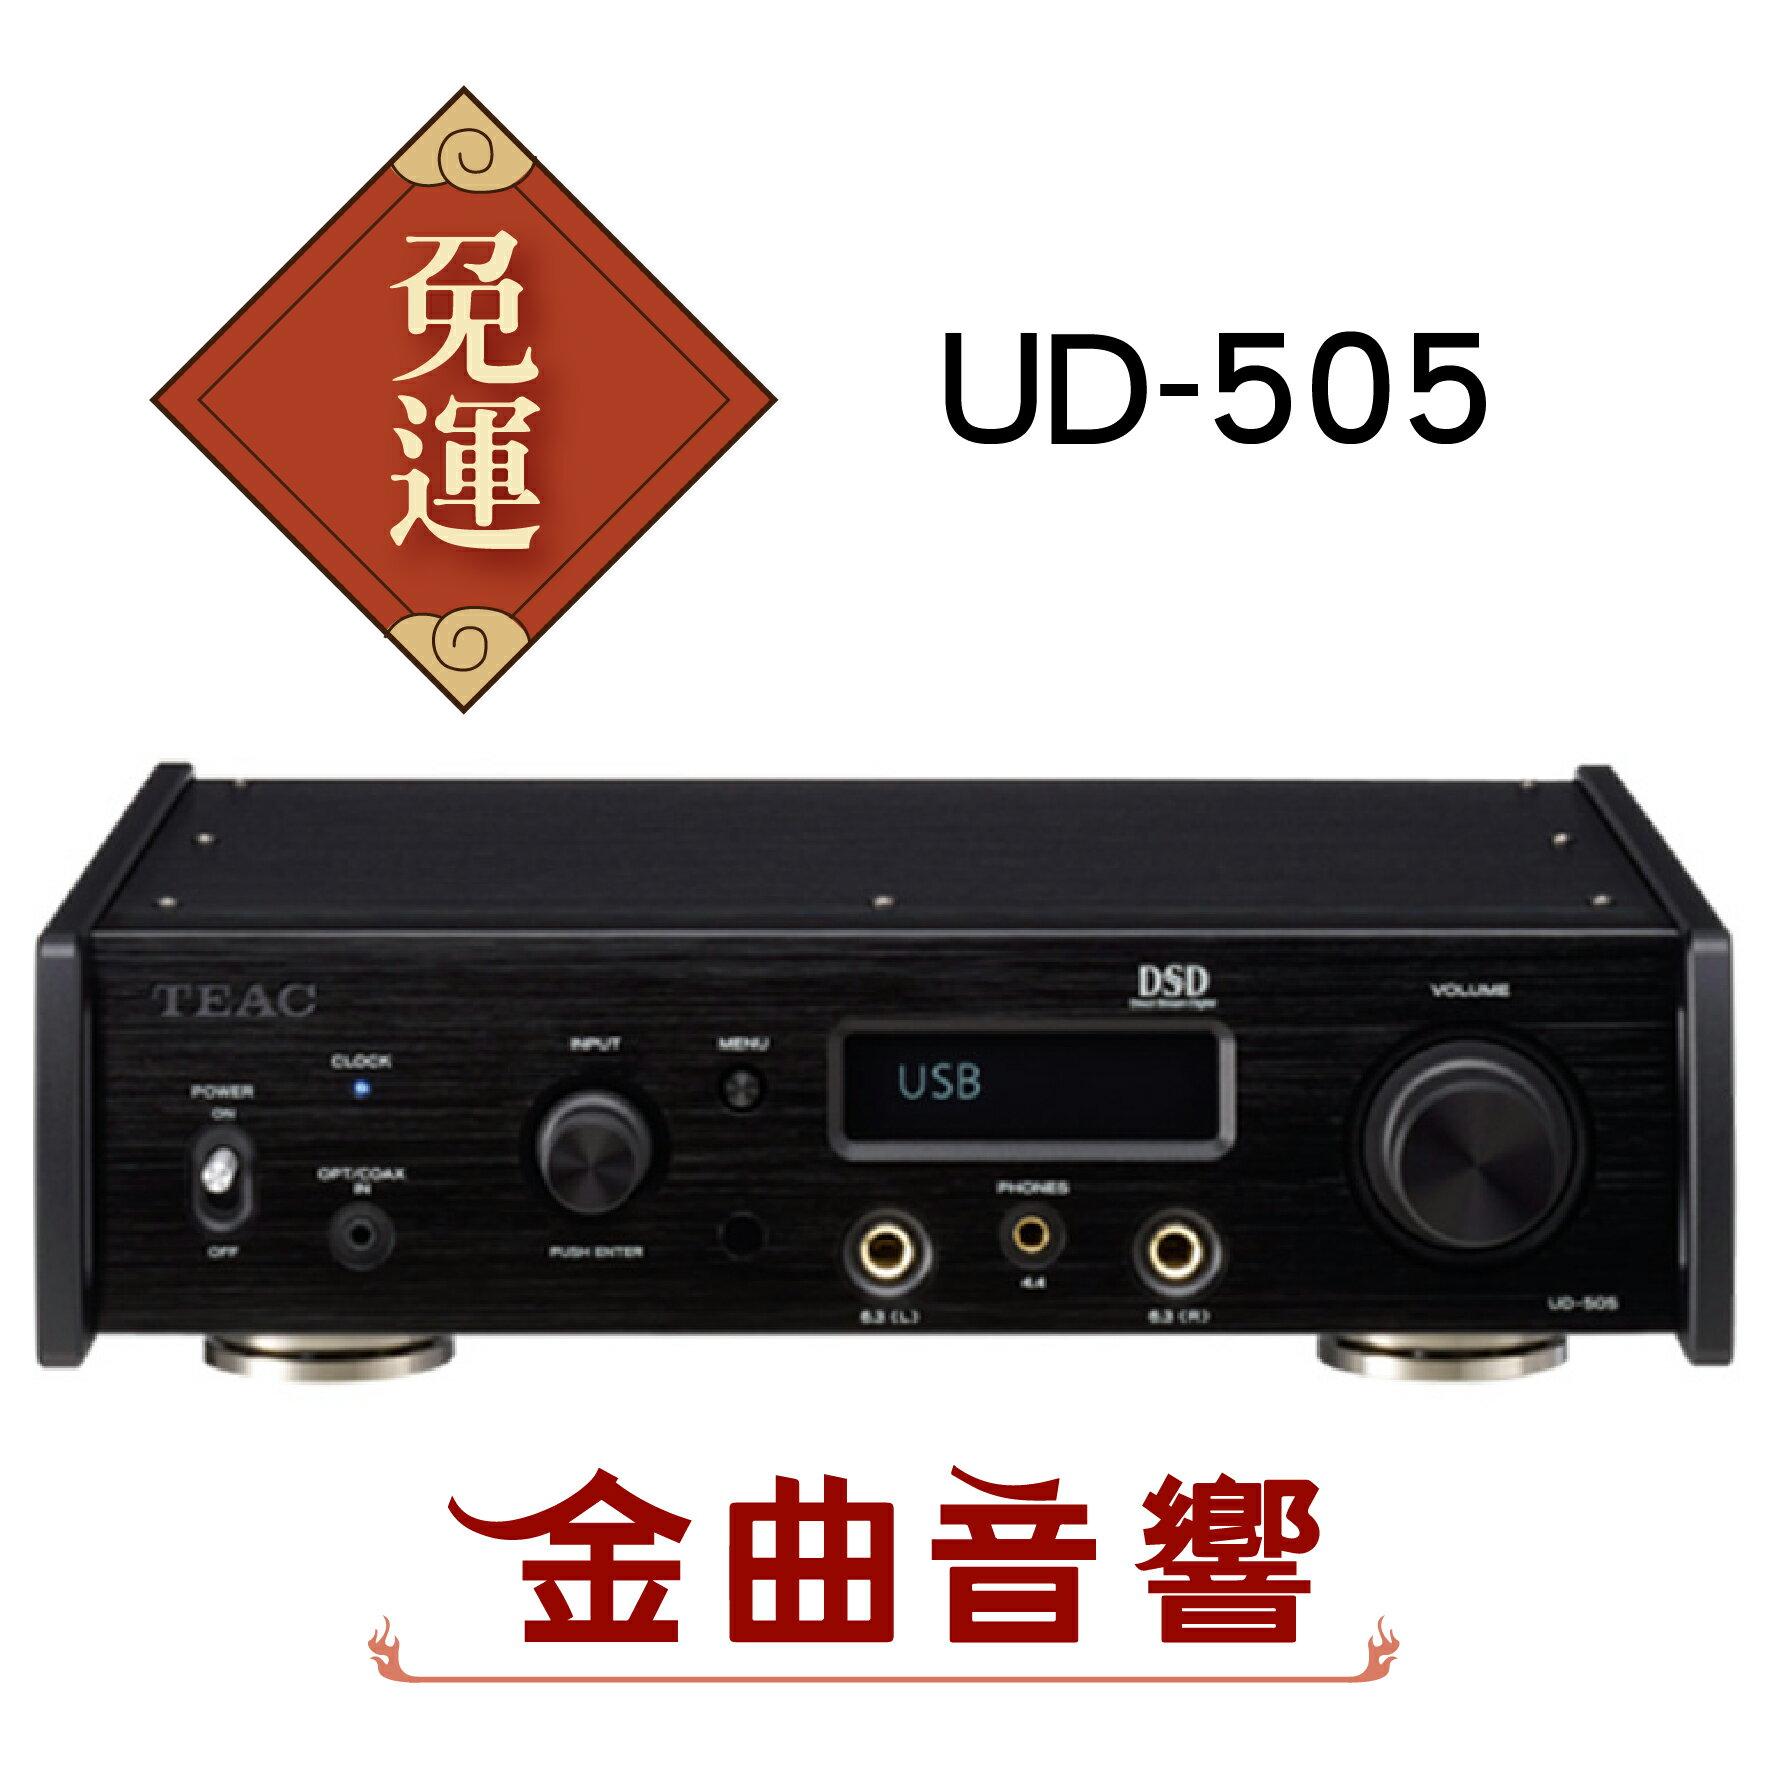 TEAC UD-505 黑 DAC 耳機 擴大機 前級 DSD 平衡電路 4.4mm MQA HiRes | 金曲音響